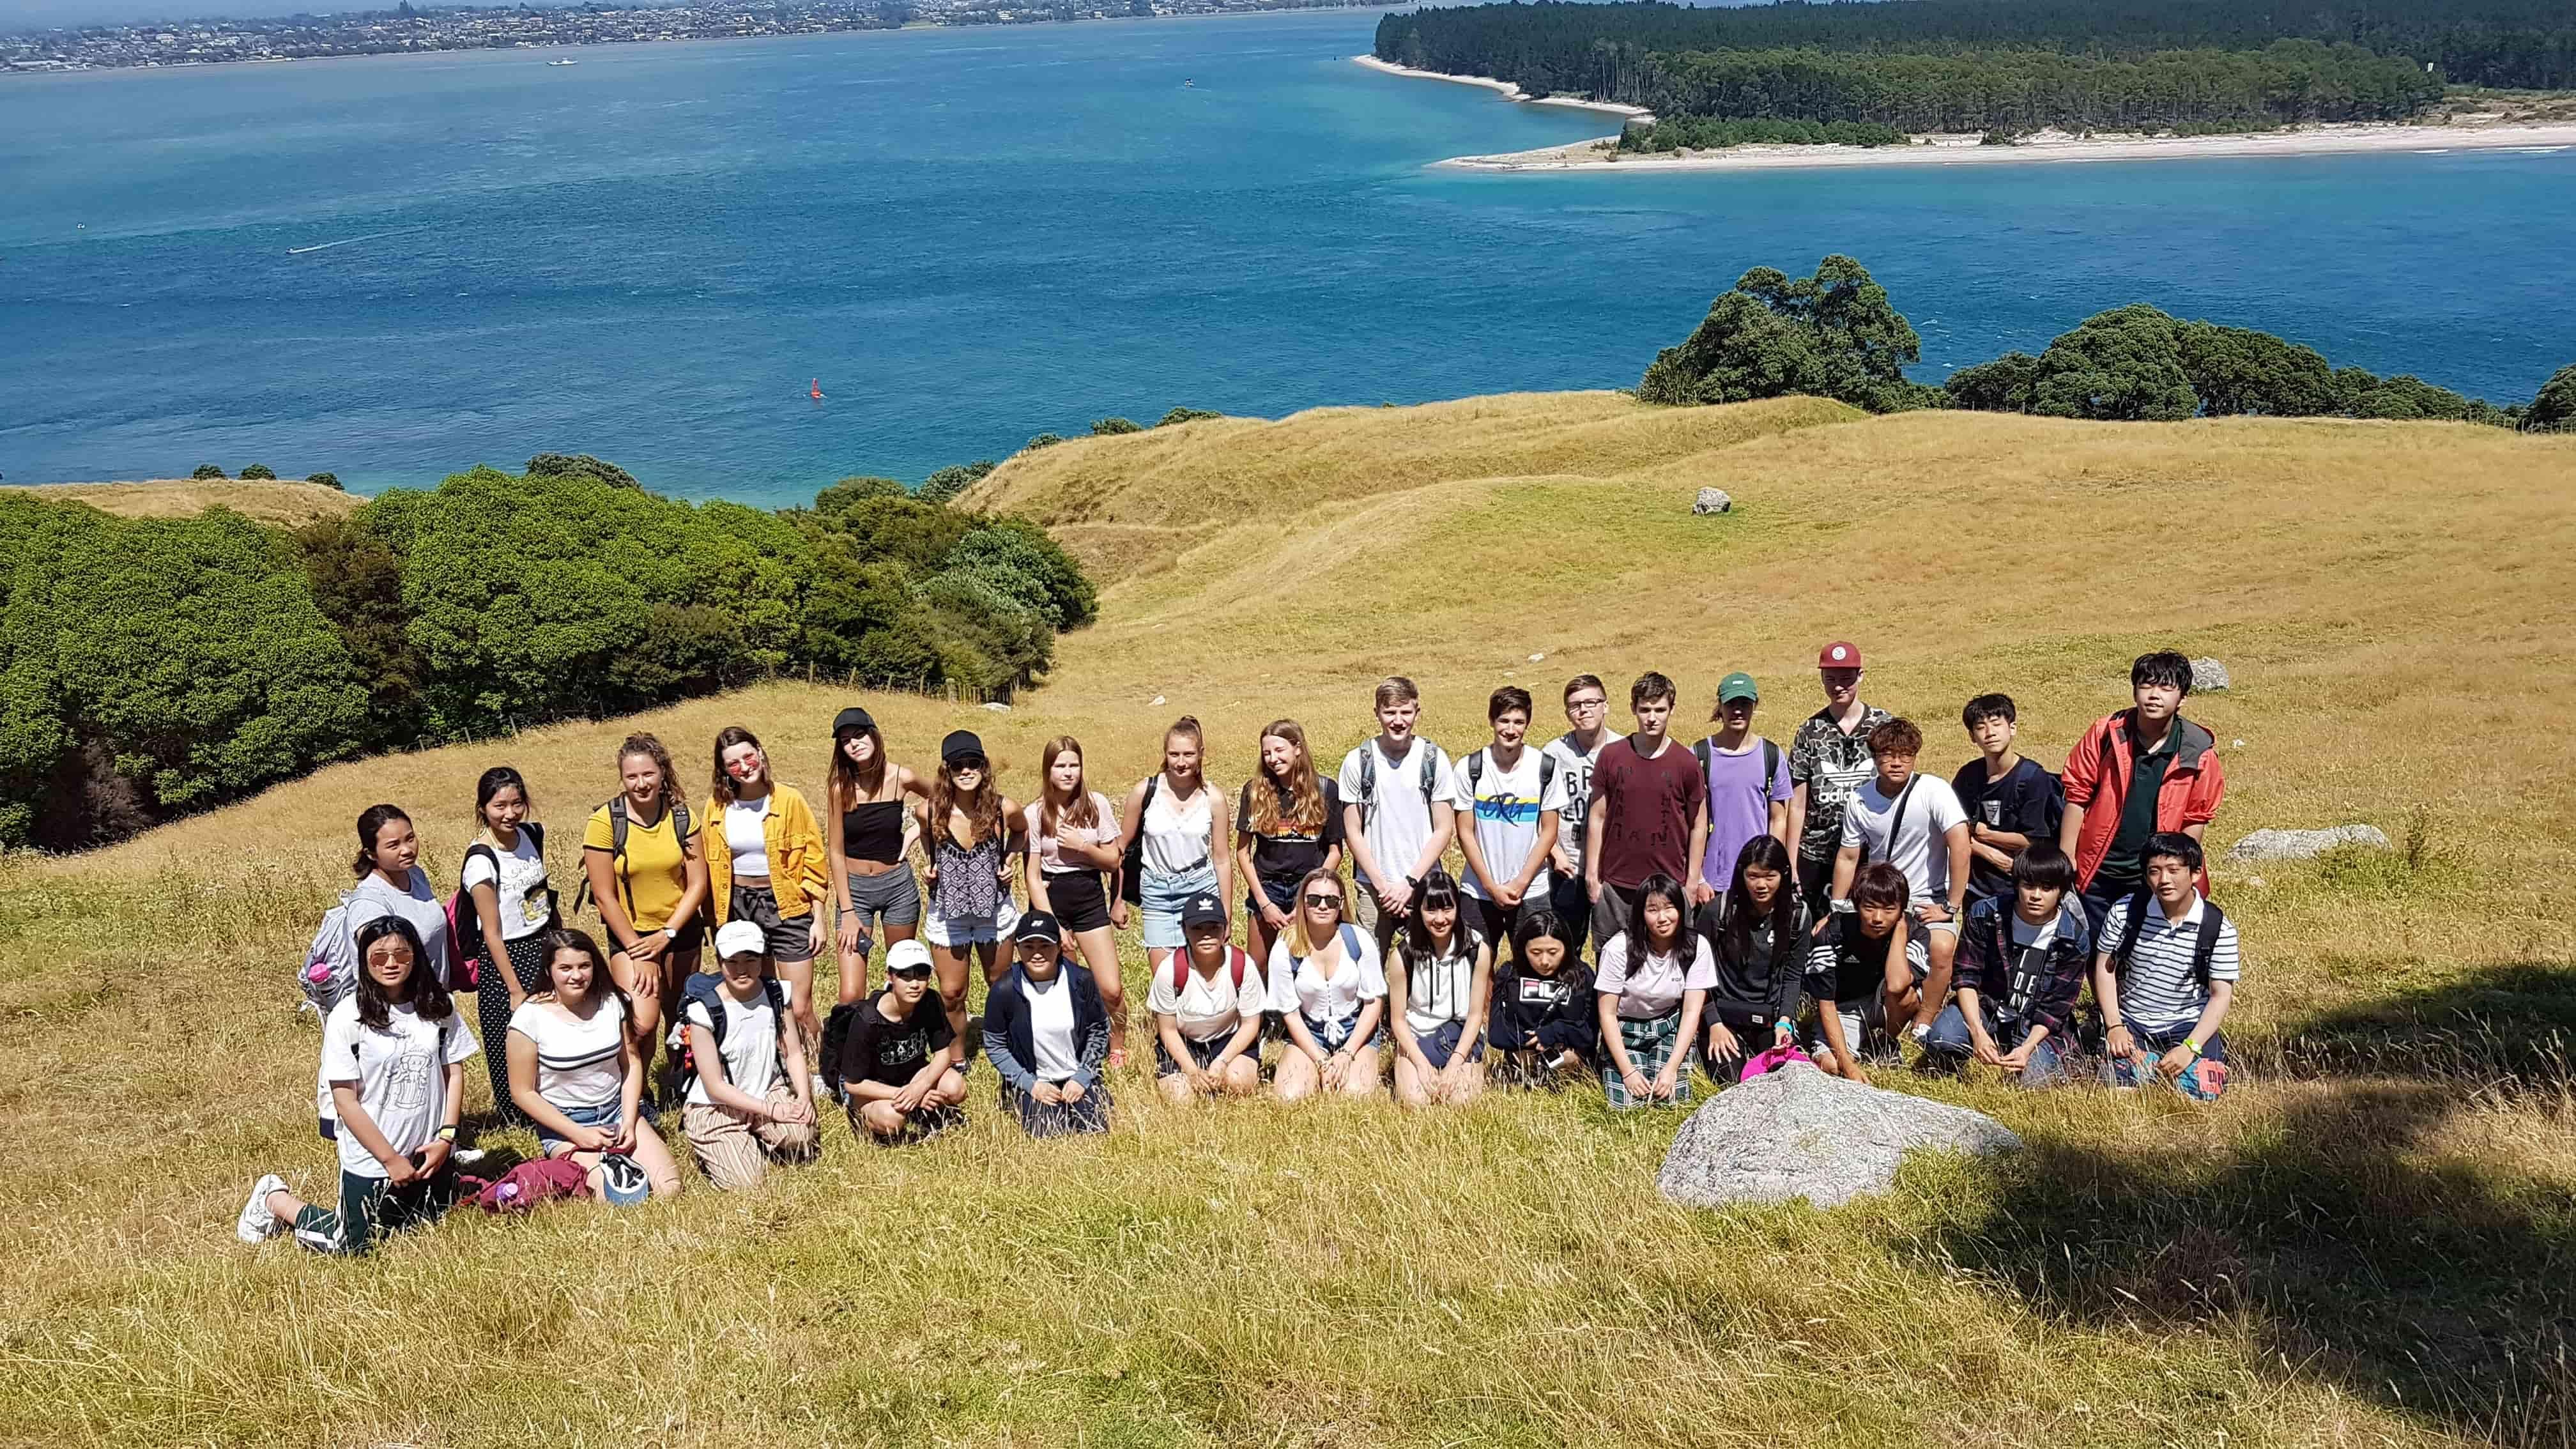 February group photo - mount-min-min